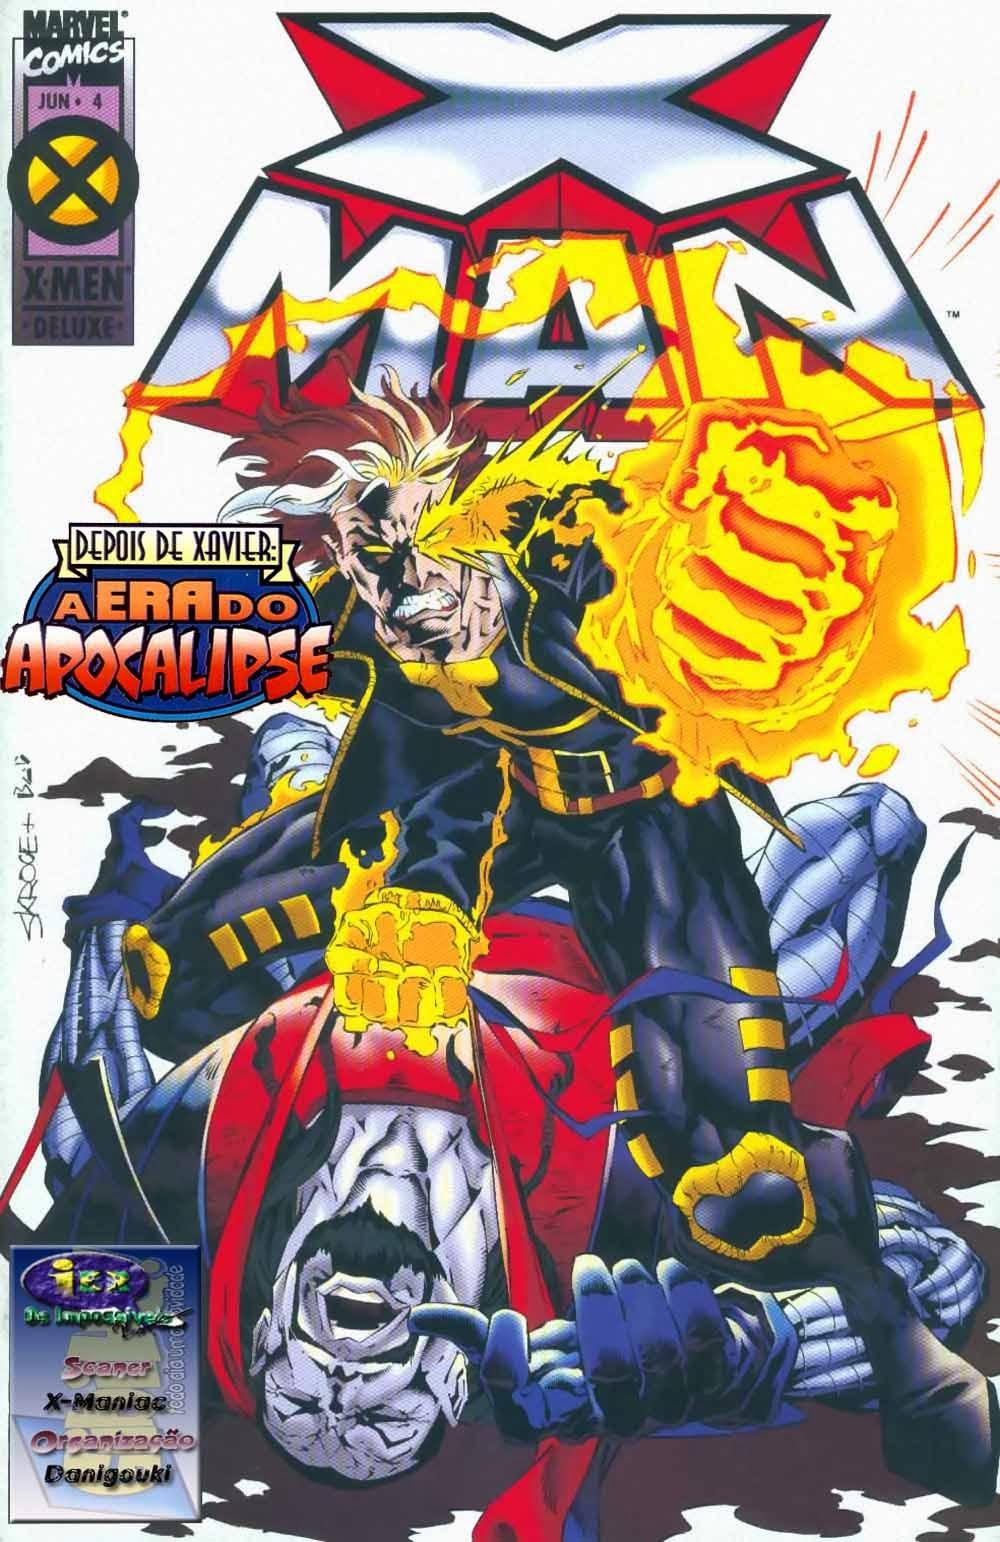 X-Men - A Era do Apocalipse #41